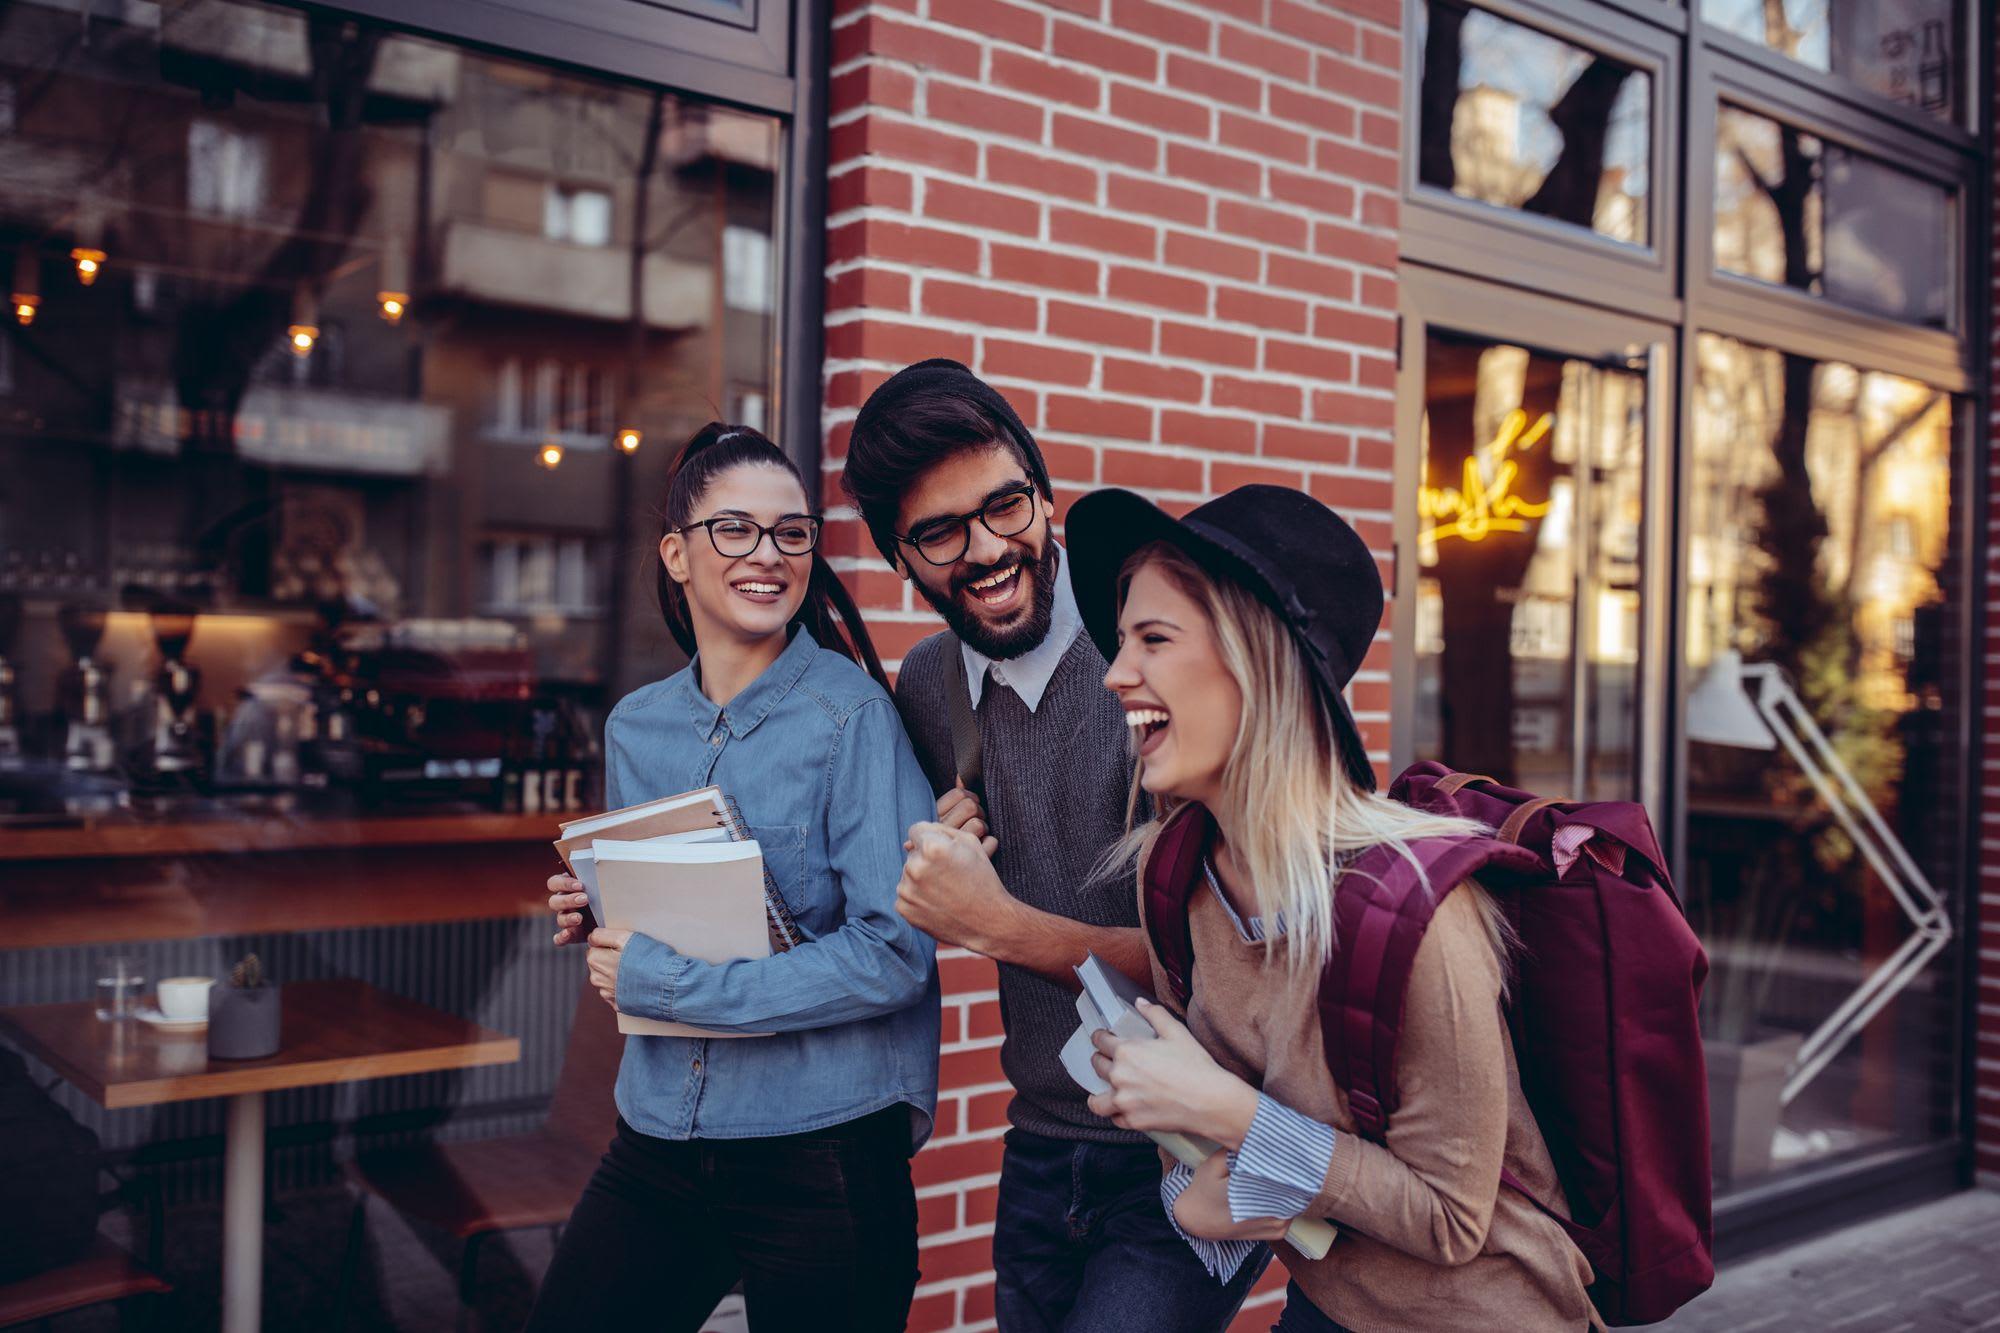 4 Self-Care Ideas For When You're Broke